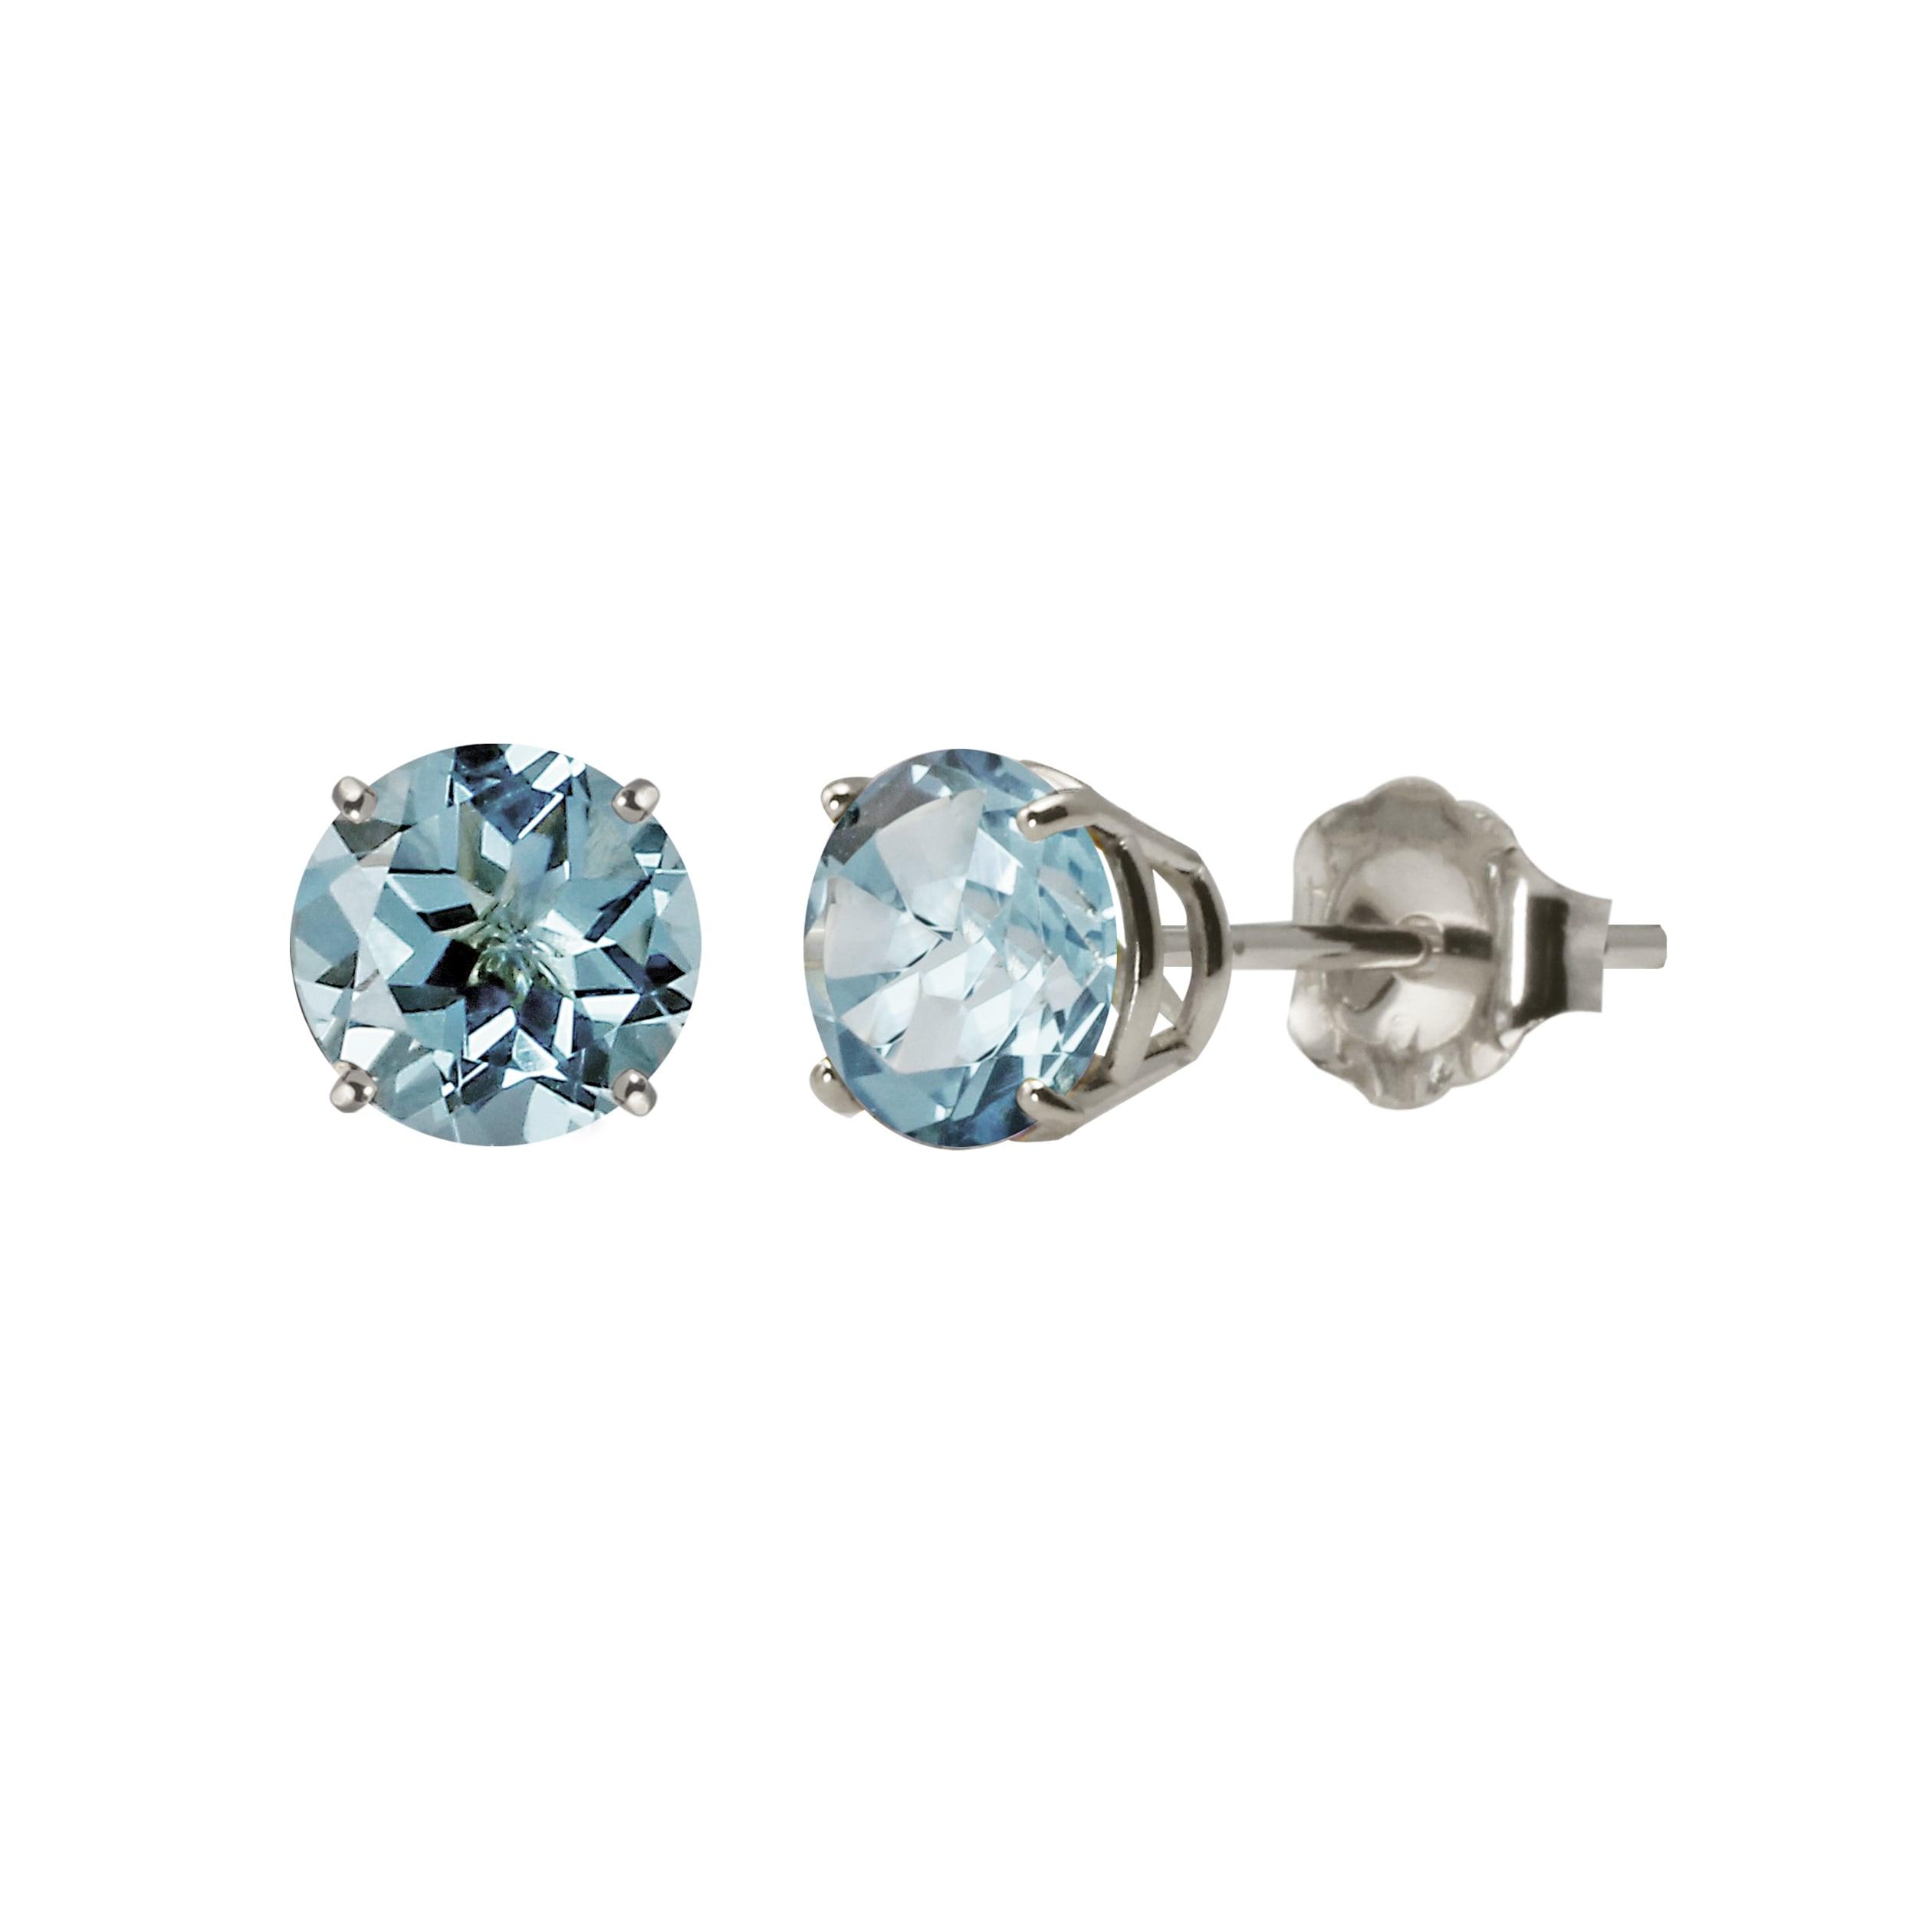 Sterling Silver 5mm Genuine Blue Topaz Stud Earrings